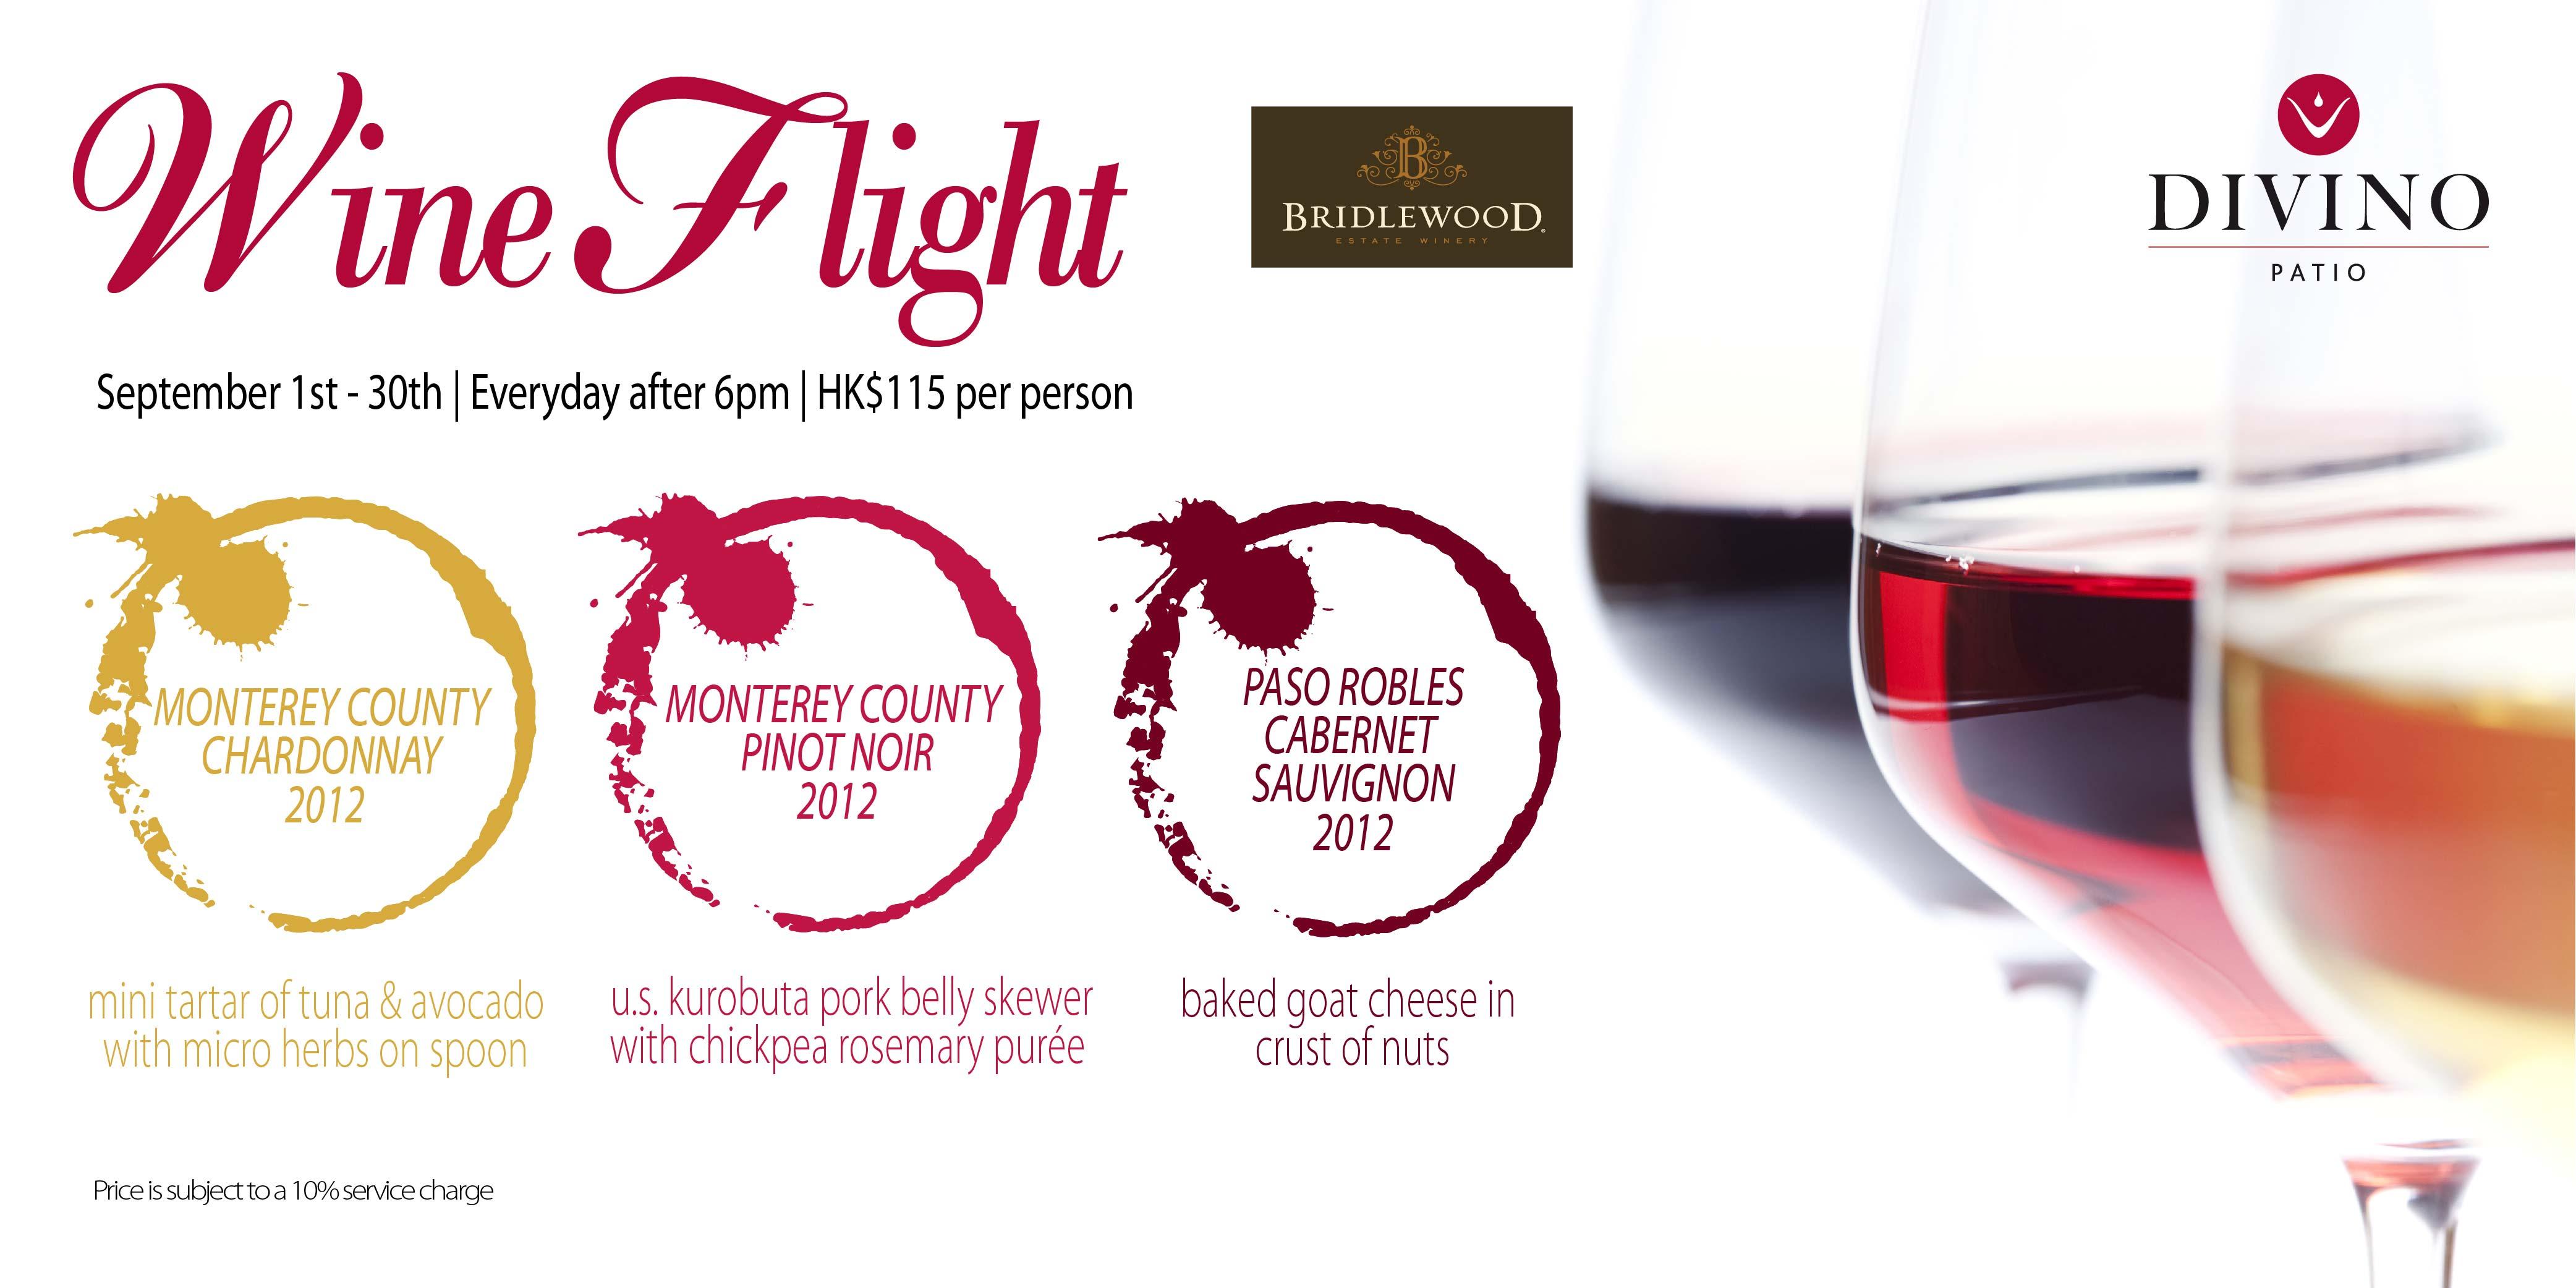 wine-flight-web-04